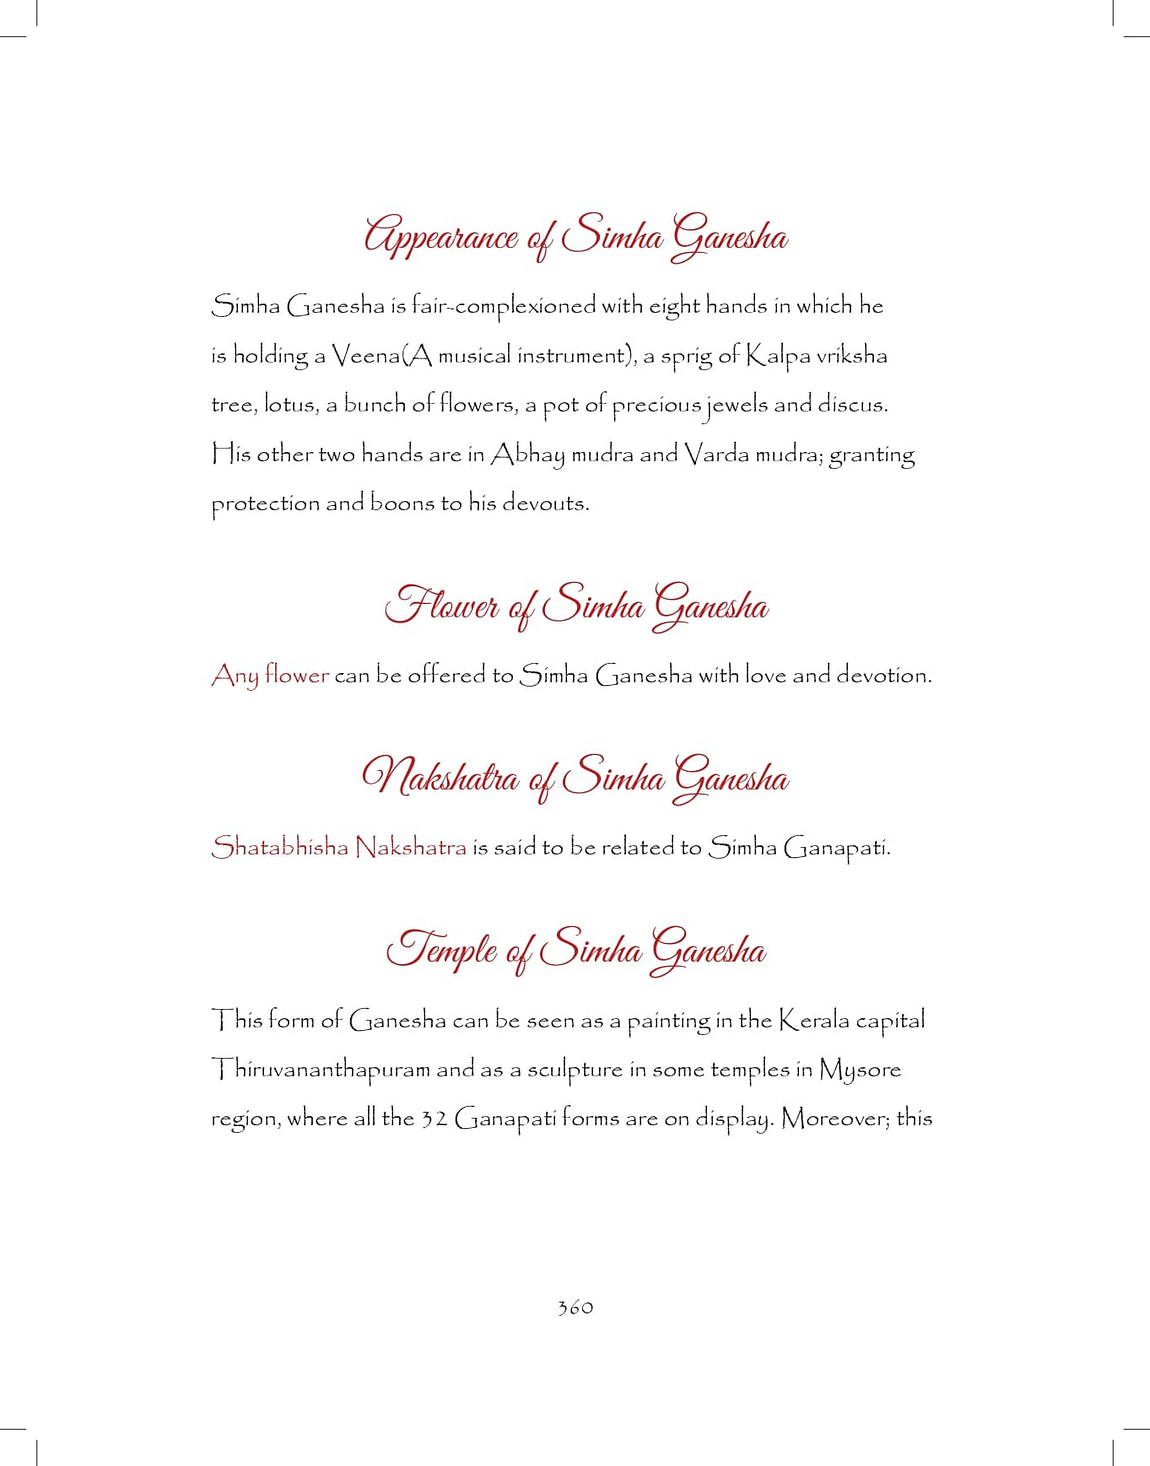 Ganesh-print_pages-to-jpg-0360.jpg